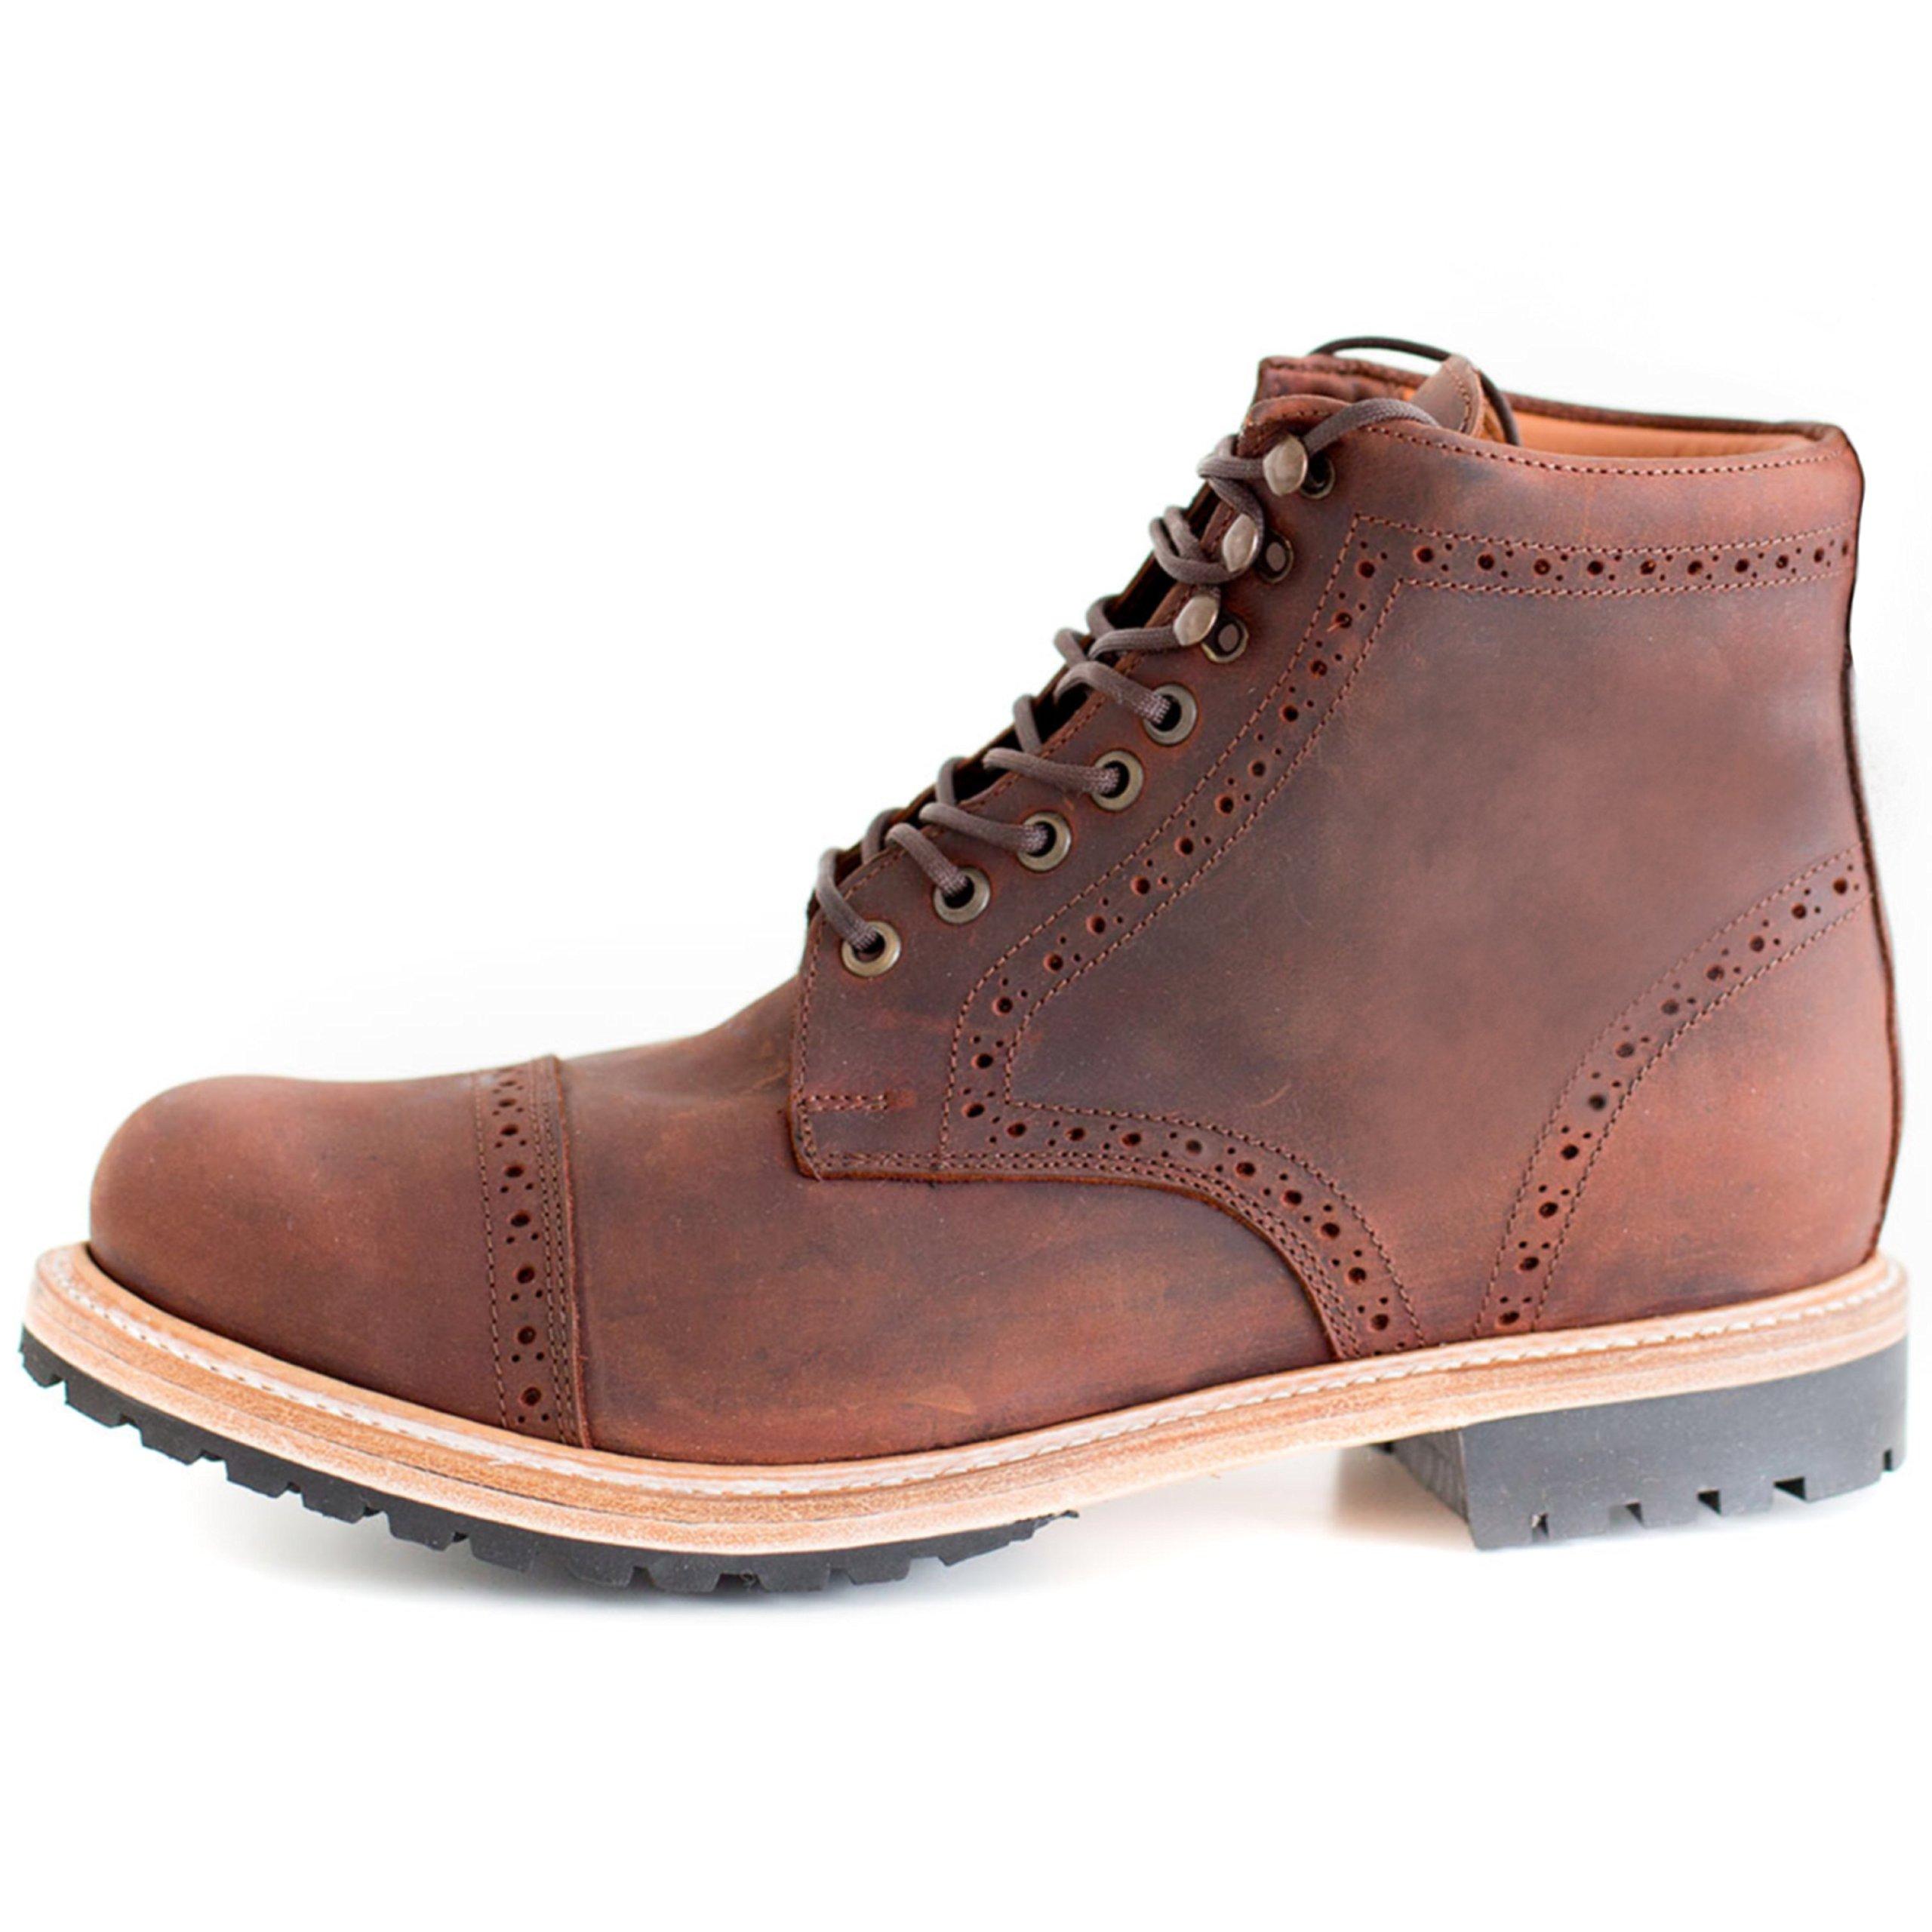 Wilcox Boots | Classic Style + Premium Comfort Fairfax Rust Brown-13